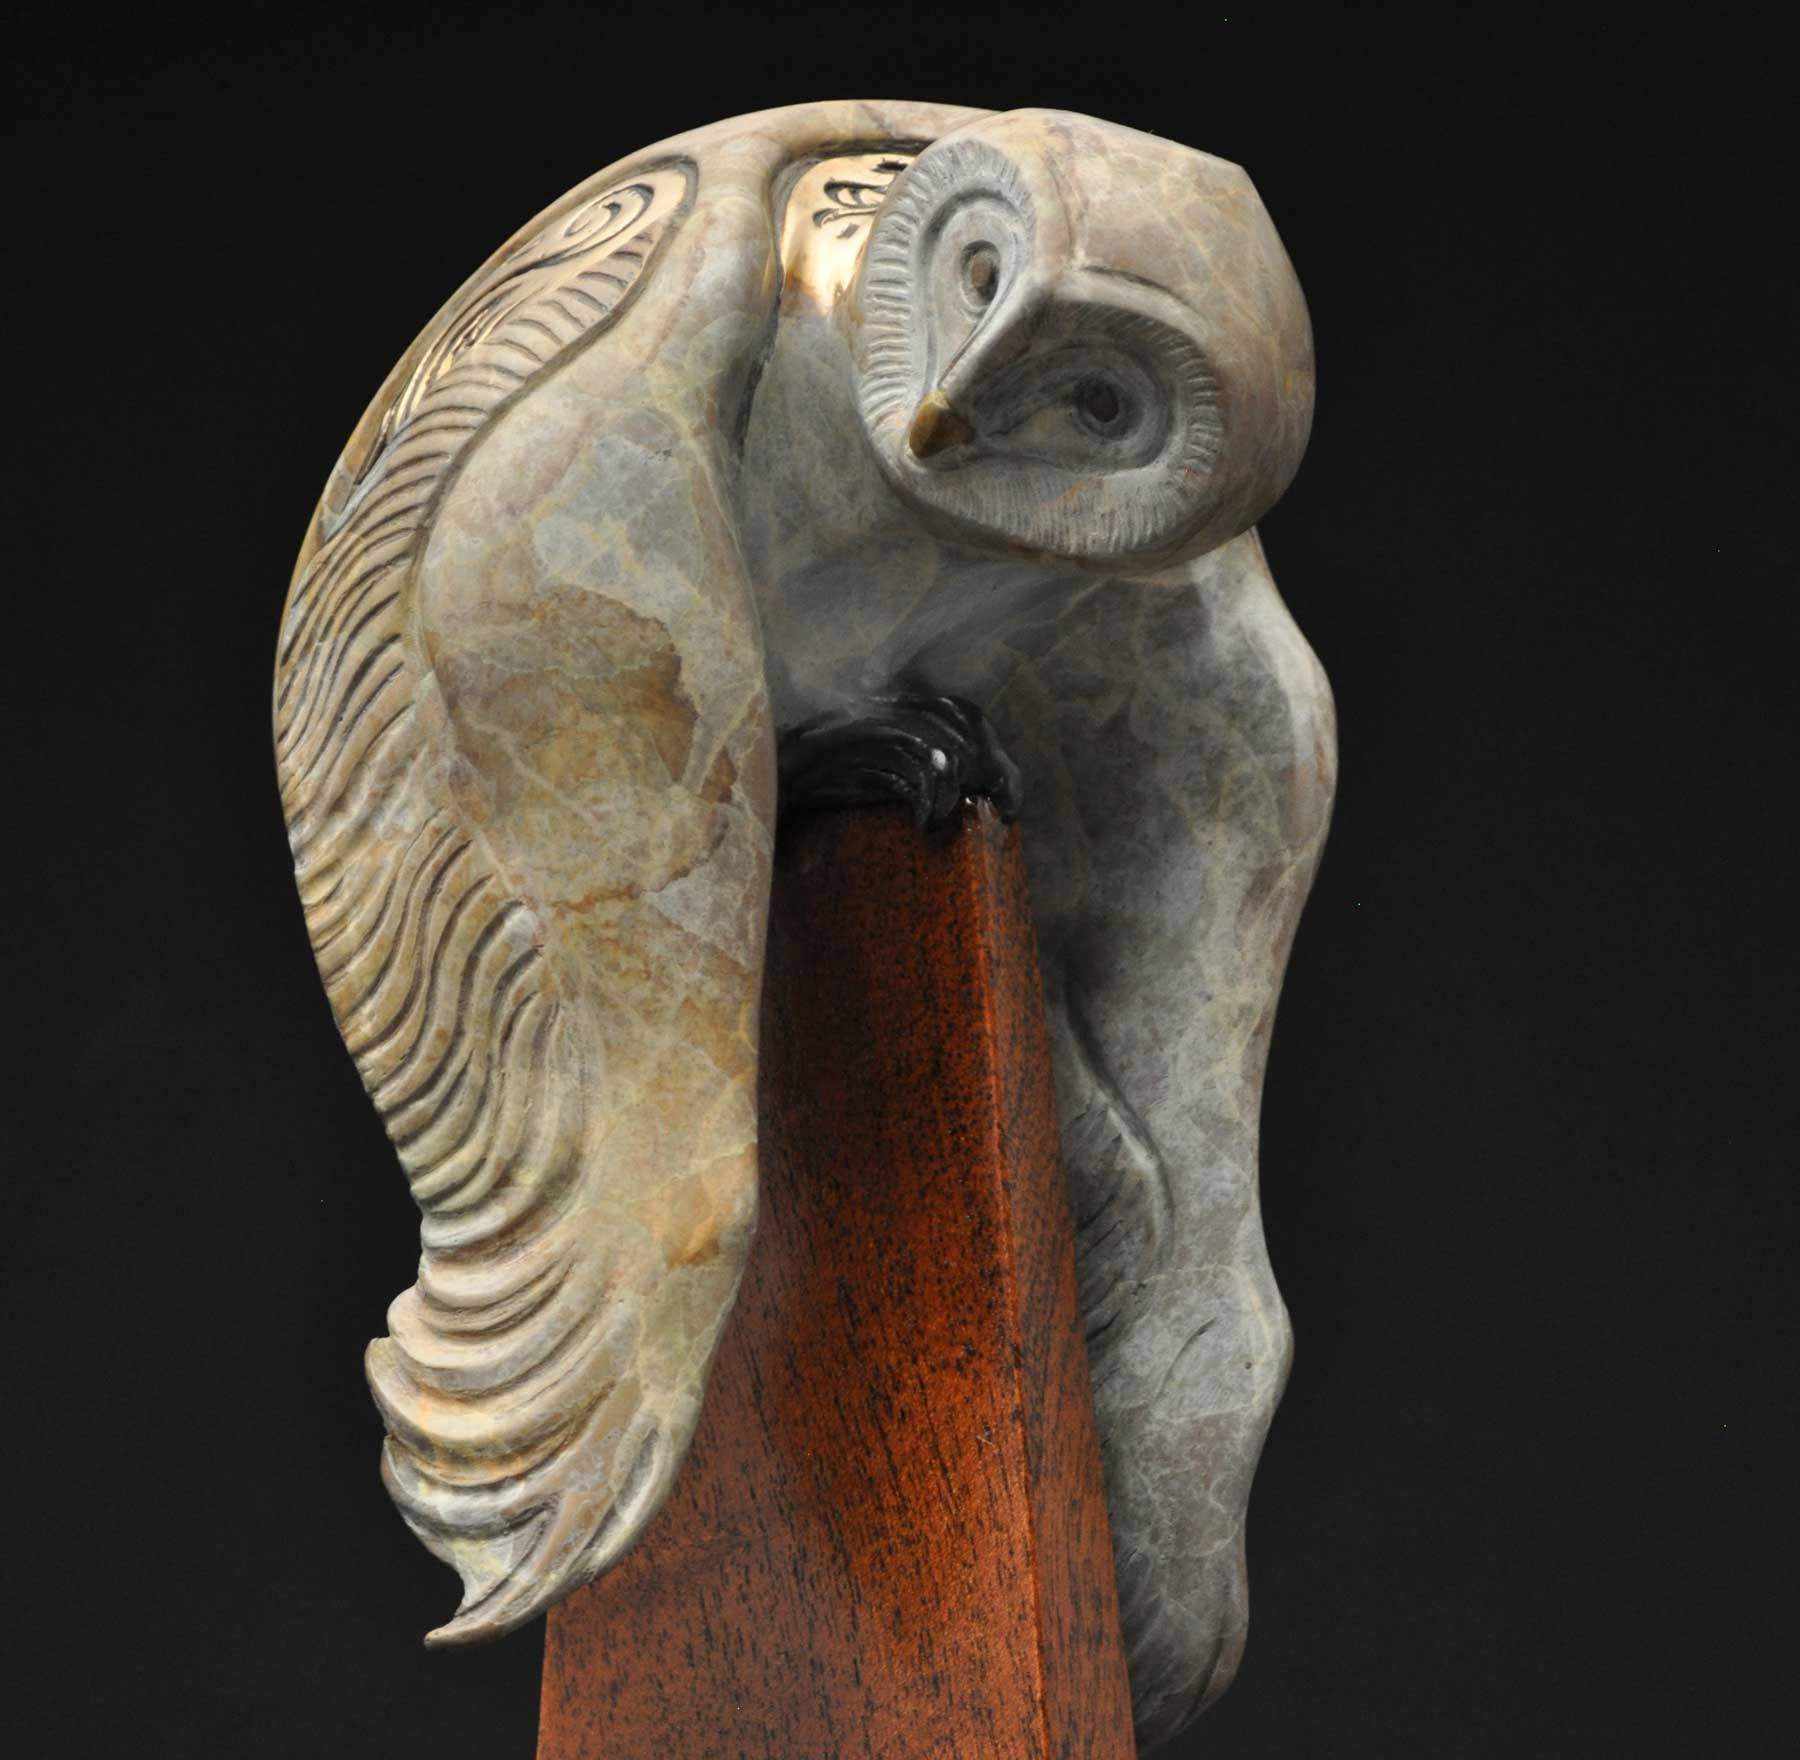 bronze-owl-sculpture-john-maisano---80.jpg